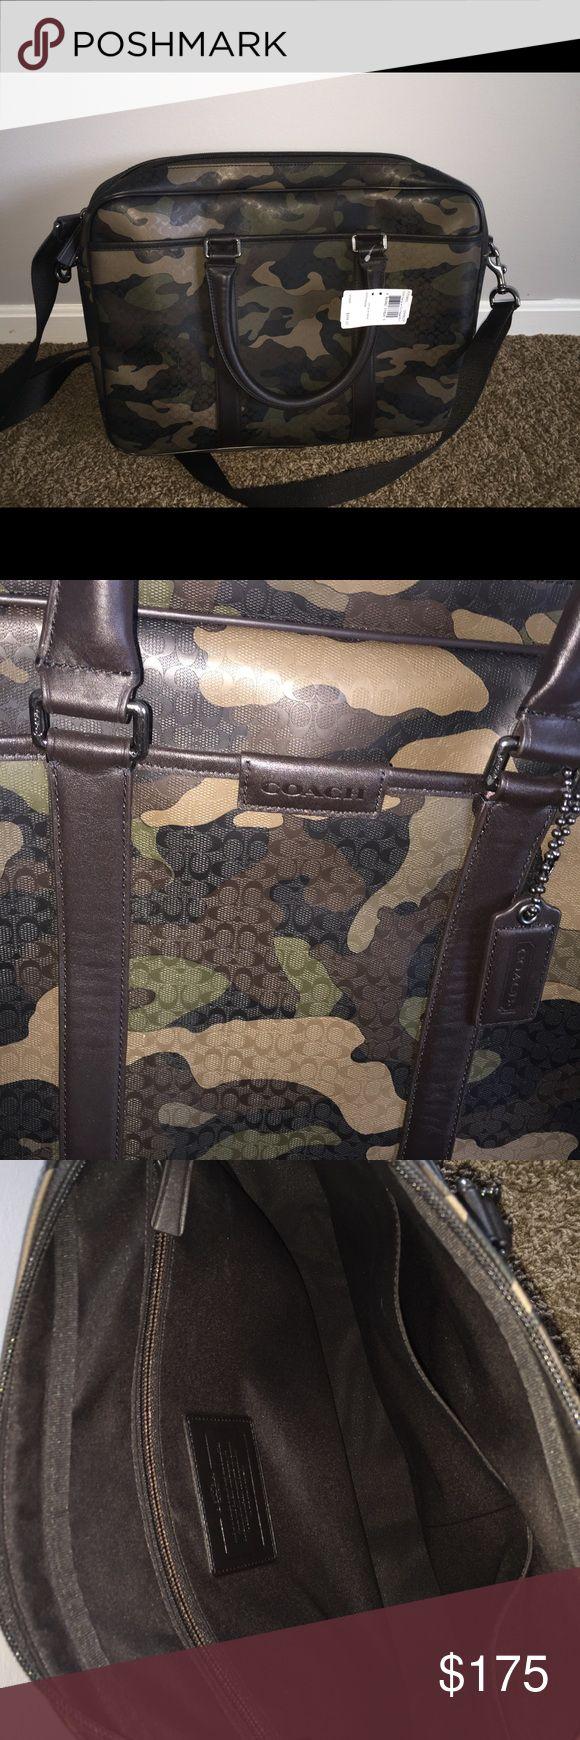 Coach Camo Classic C Messenger Bag NWT Brand New with tags, Coach Camo Classic C Messenger bag. Great work bag for men/women! NO TRADES! Coach Bags Laptop Bags